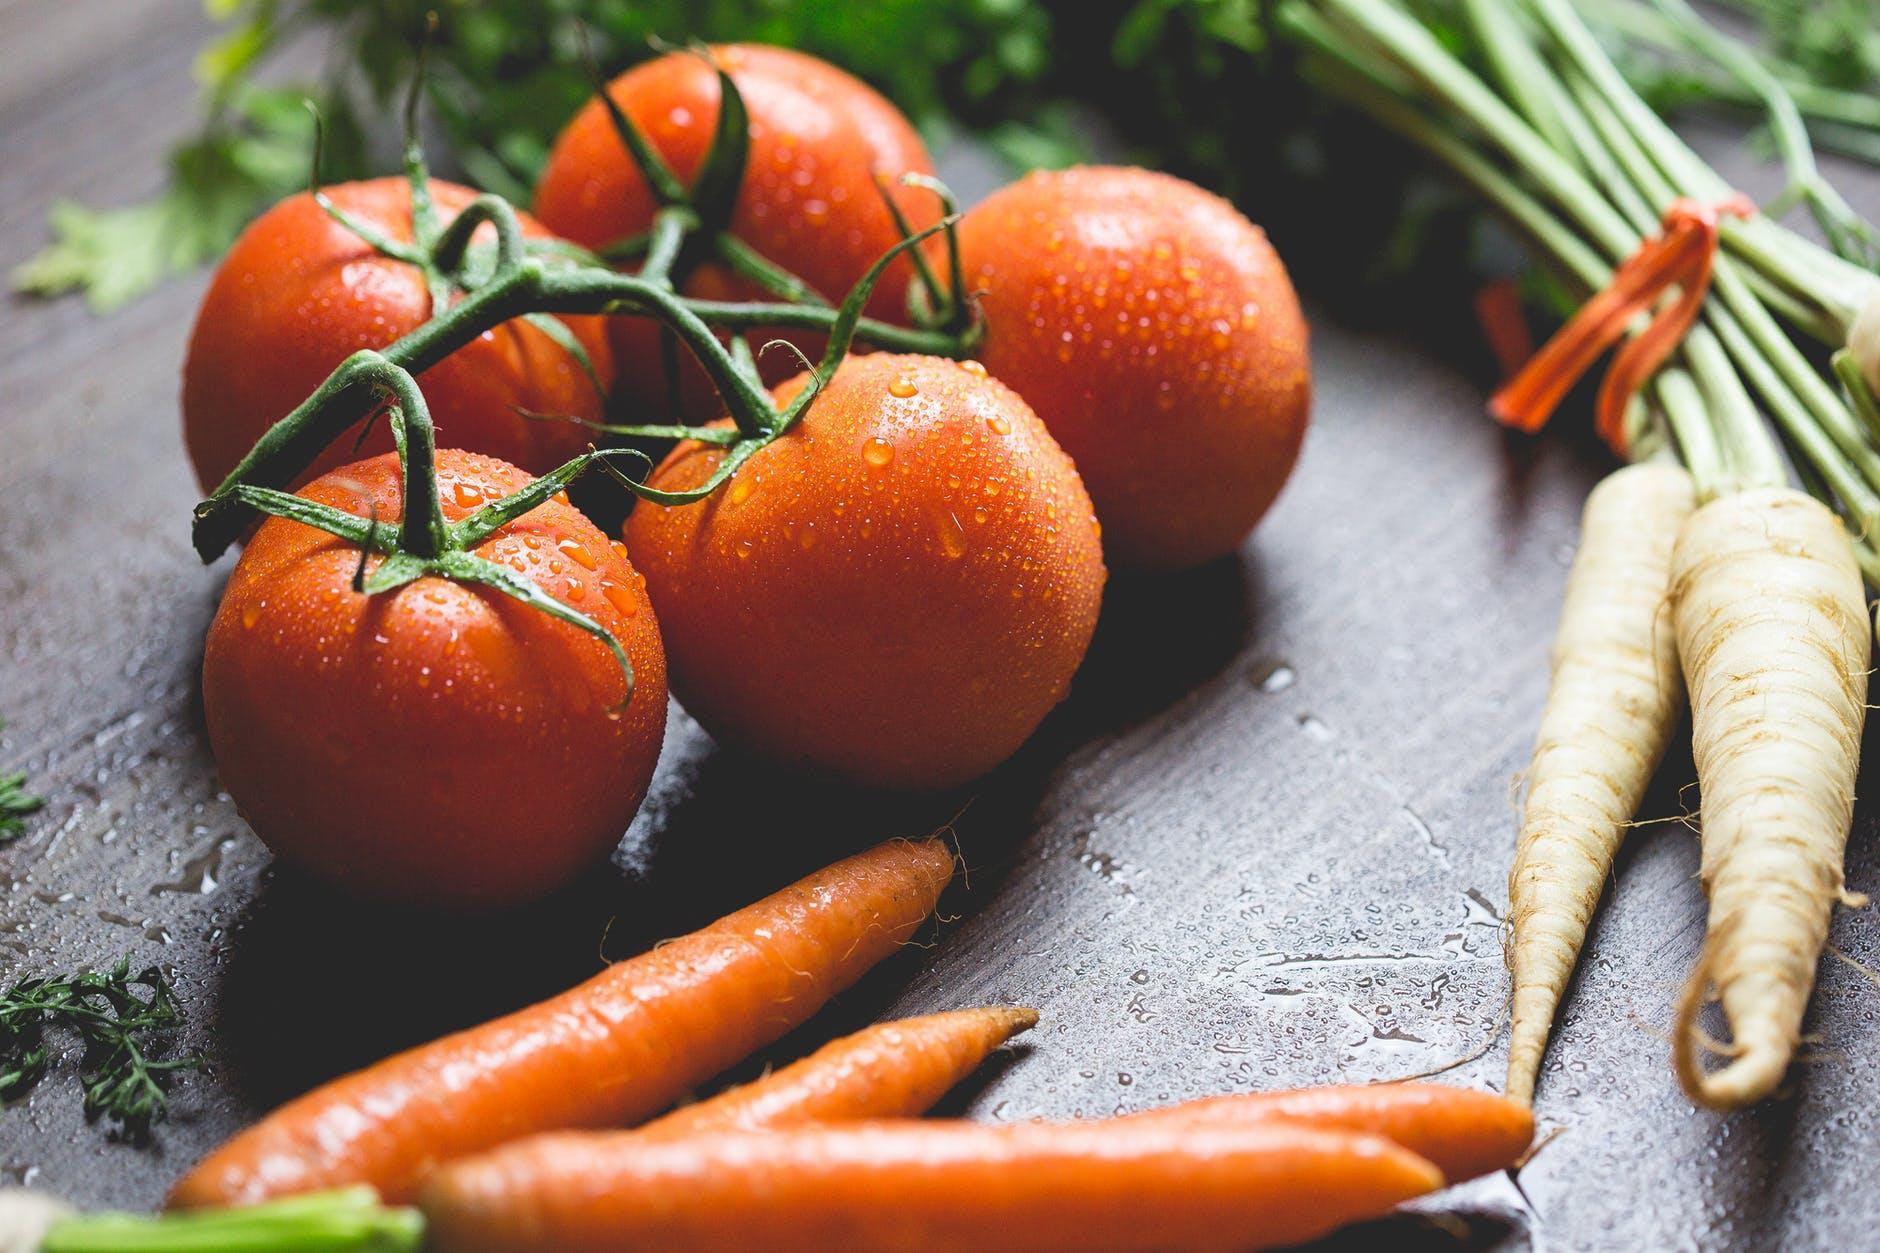 5 Healthy Alternatives to Unhealthy Junk Foods